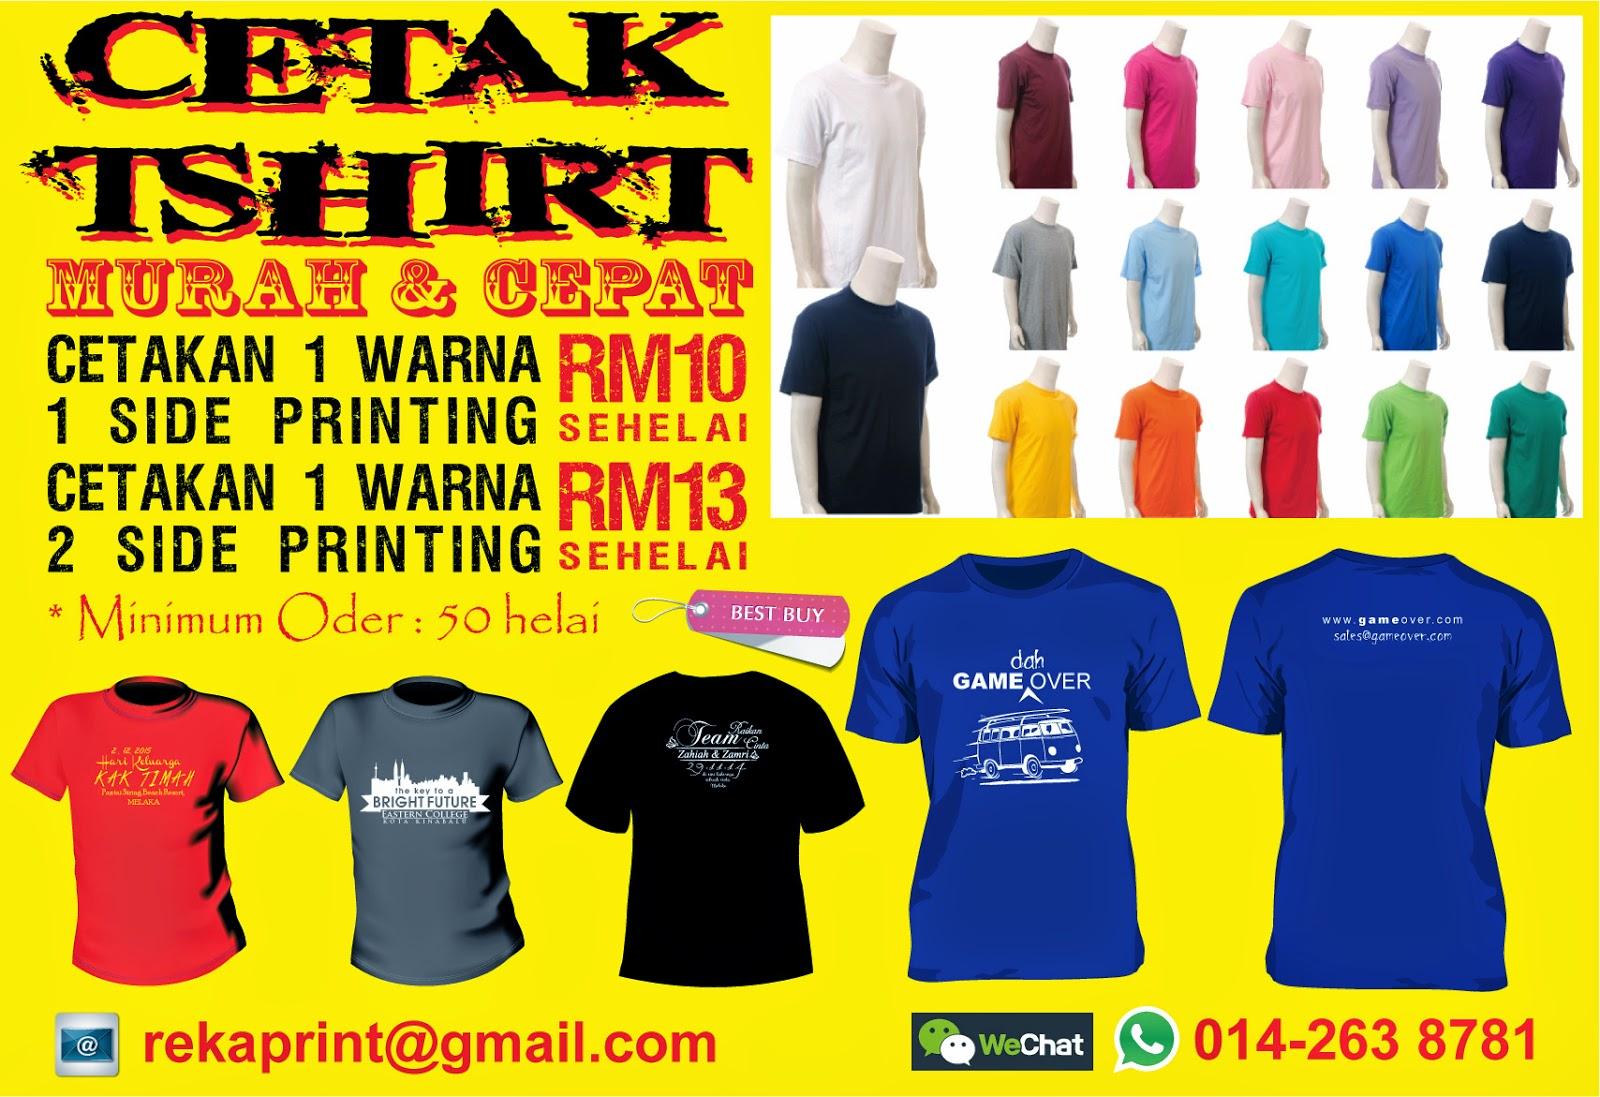 Design t shirt rewang - Design T Shirt Rewang 31